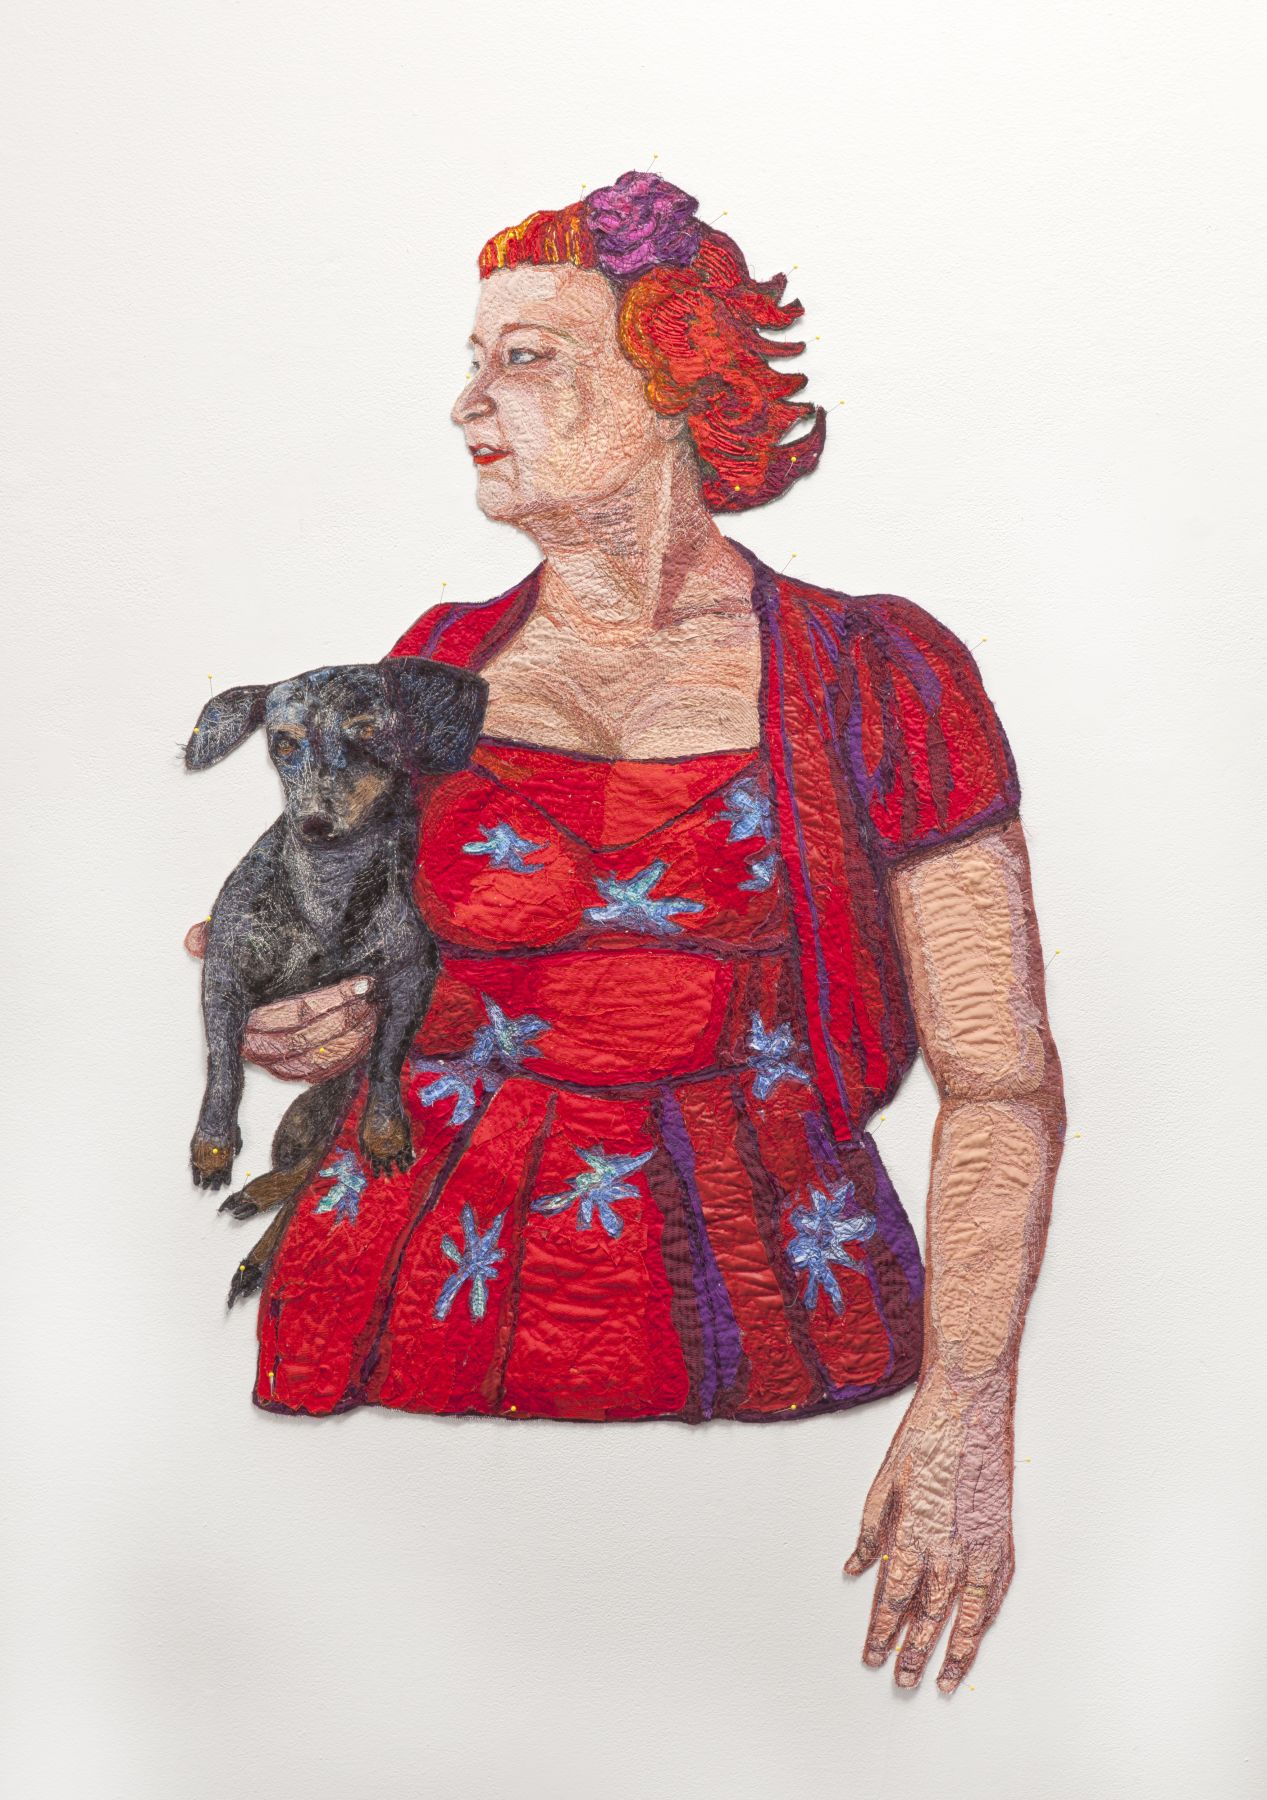 GINA PHILLIPS Joy and Ferdinand, 2016